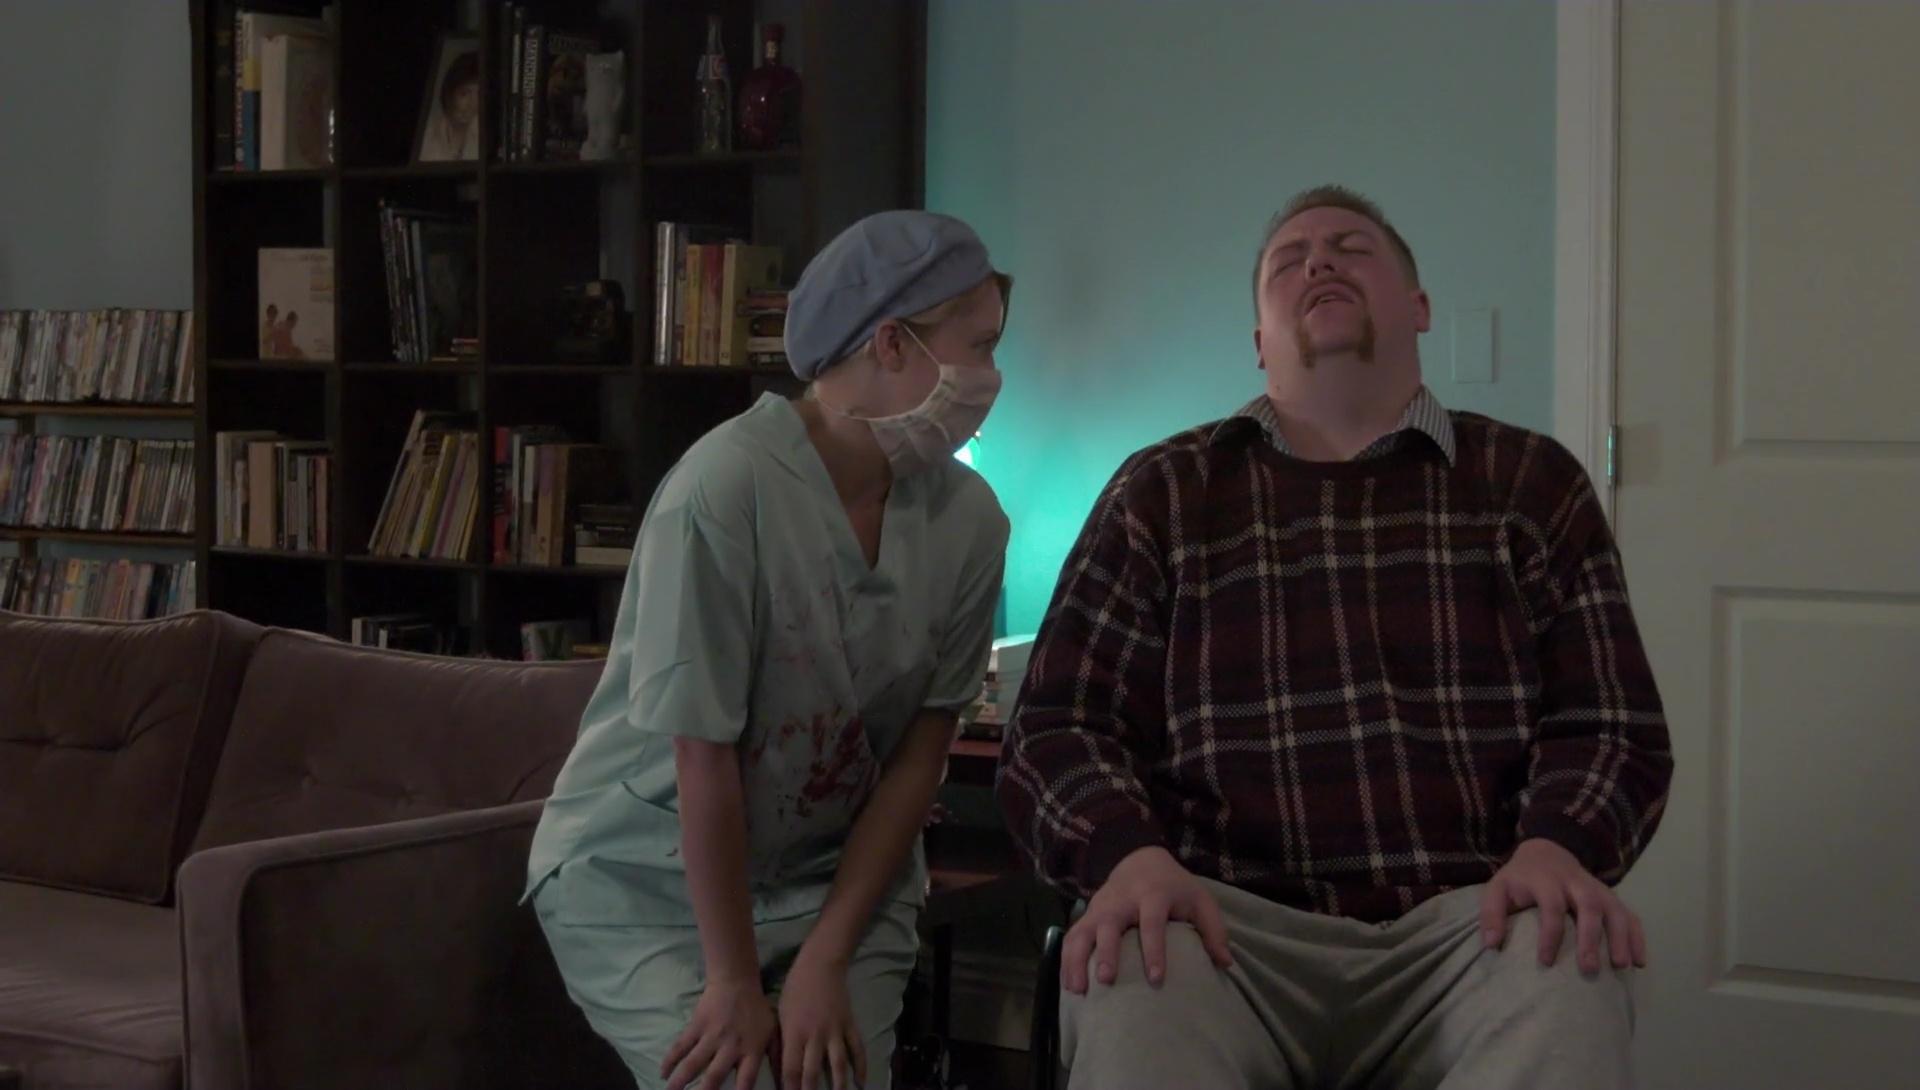 Cripple fetish